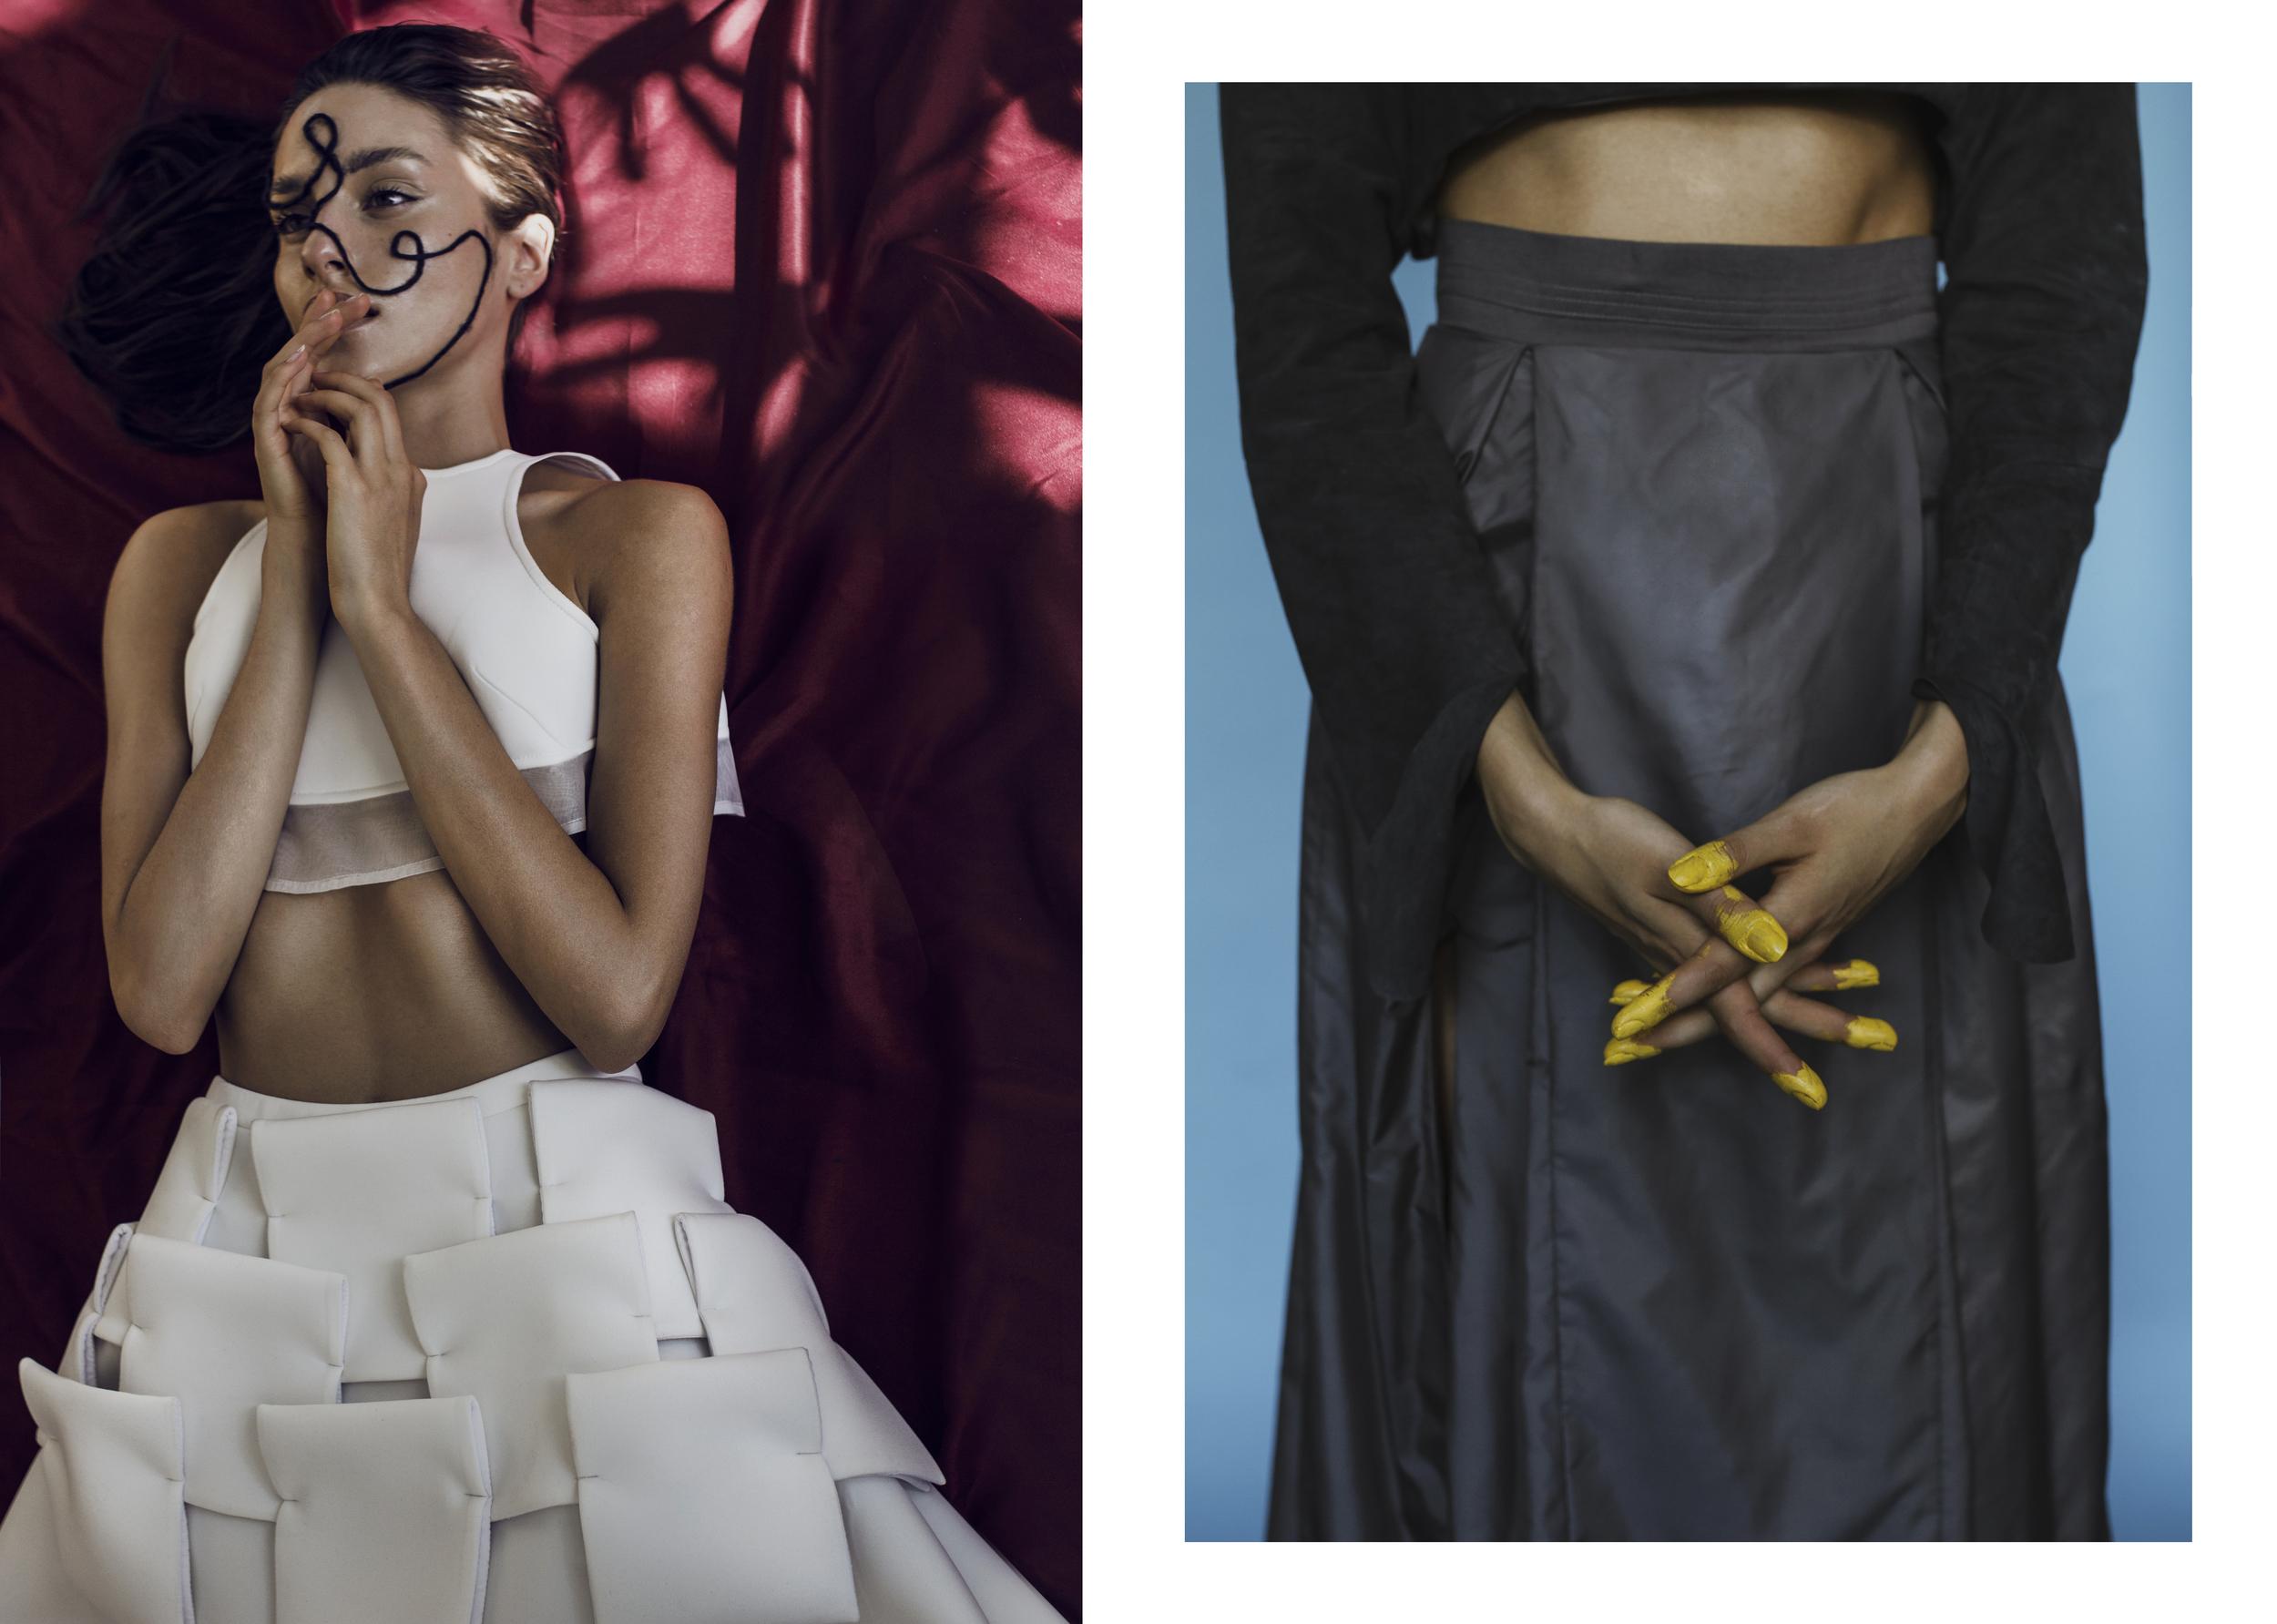 White Top & Skirt: Maya Baczynska / Black Top & Skirt: Agnieszka Kopek